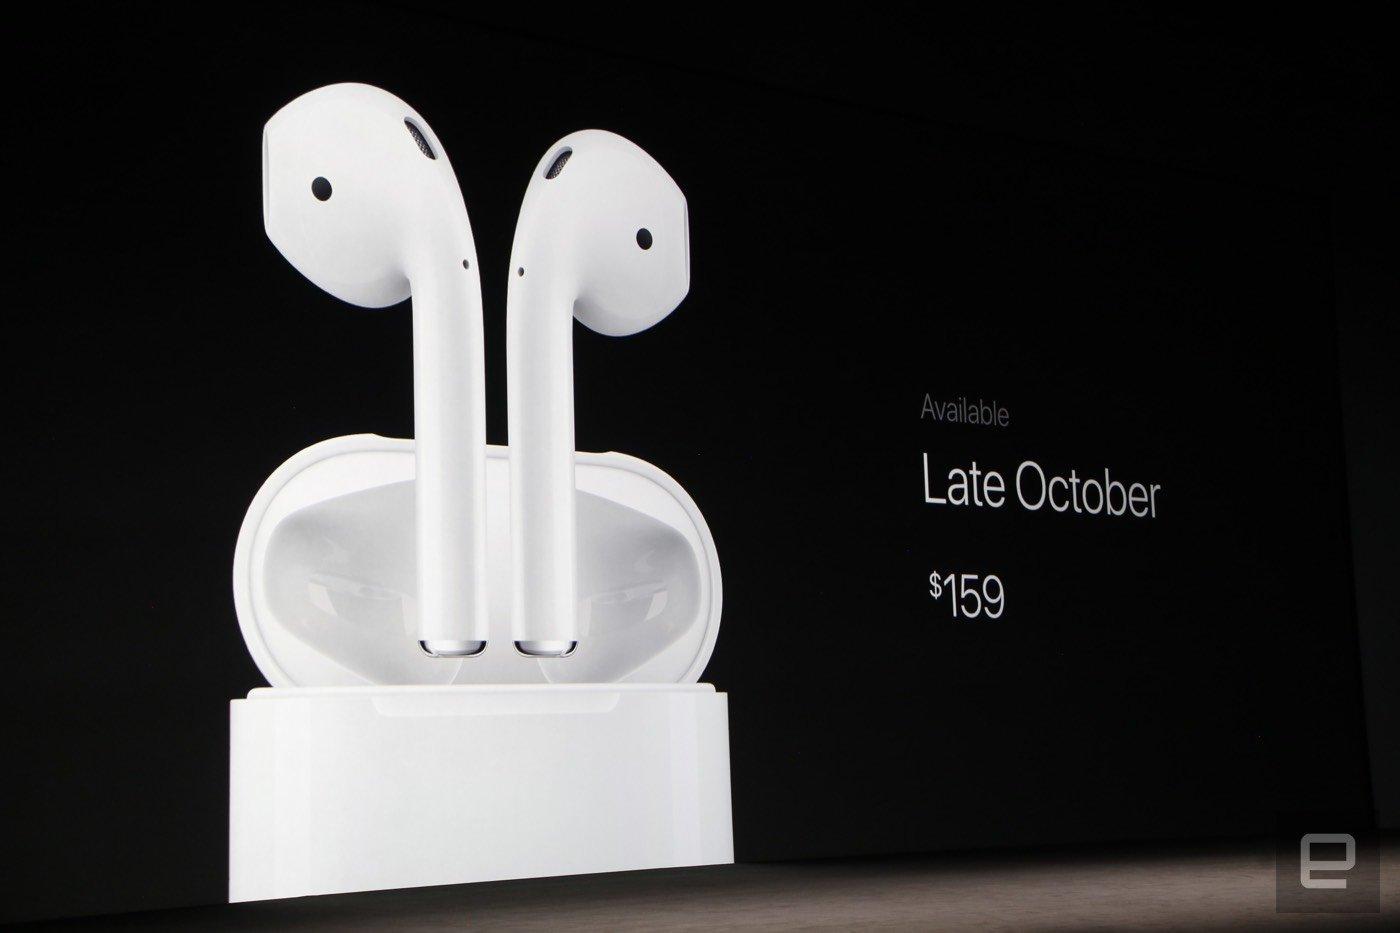 apple7-1537.jpg